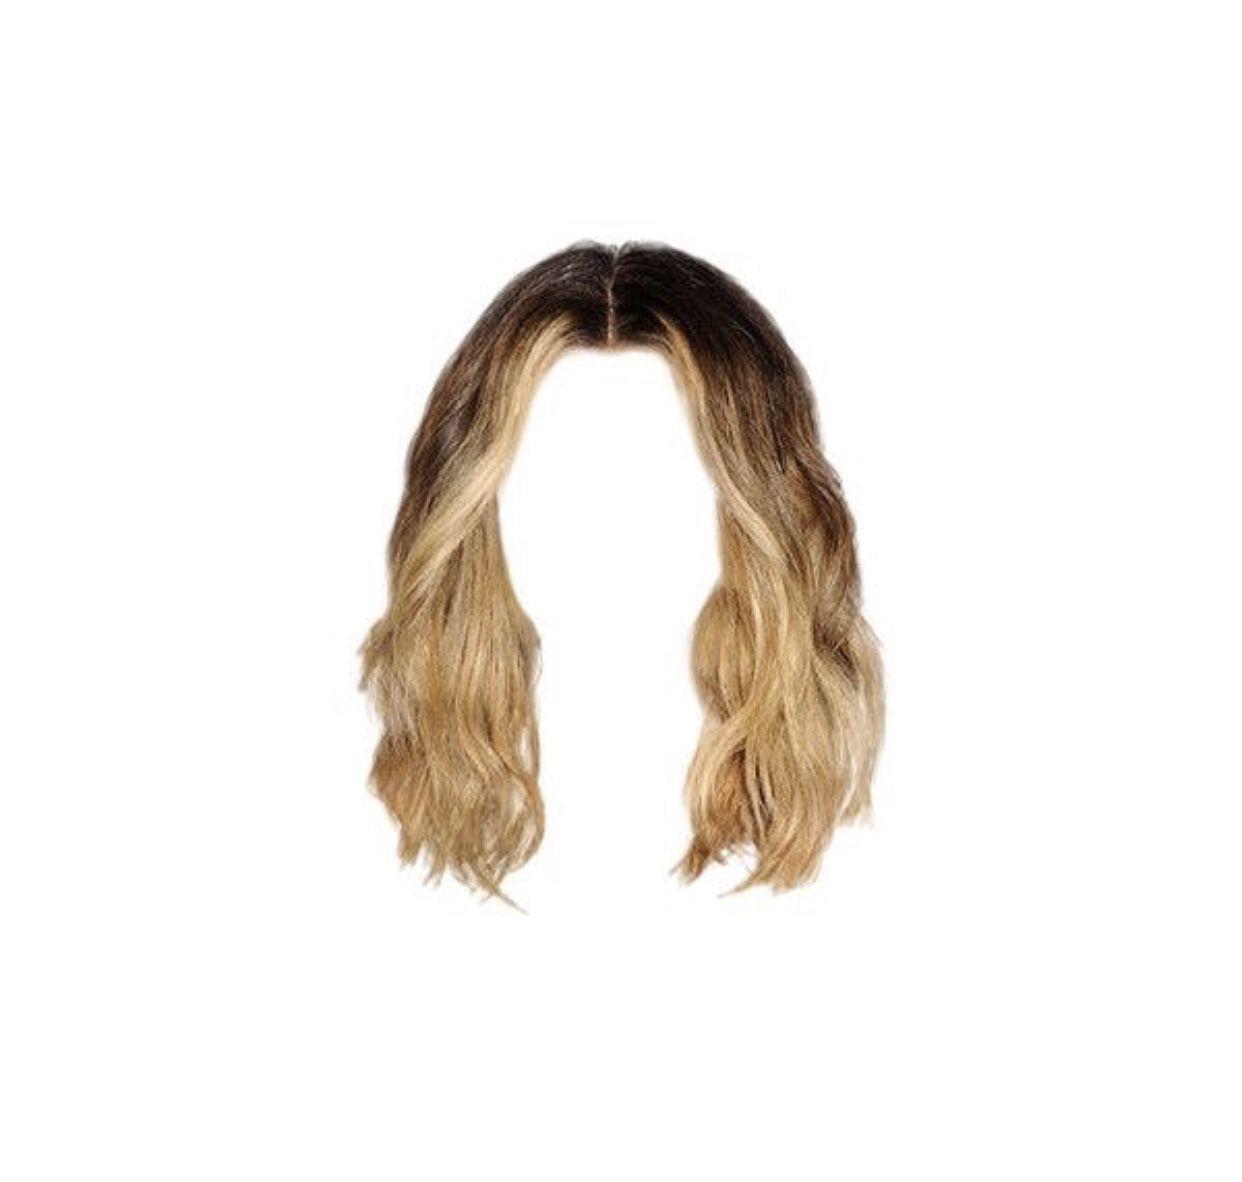 Blonde Hair Hair Png Hair Styles Blonde Wavy Hair